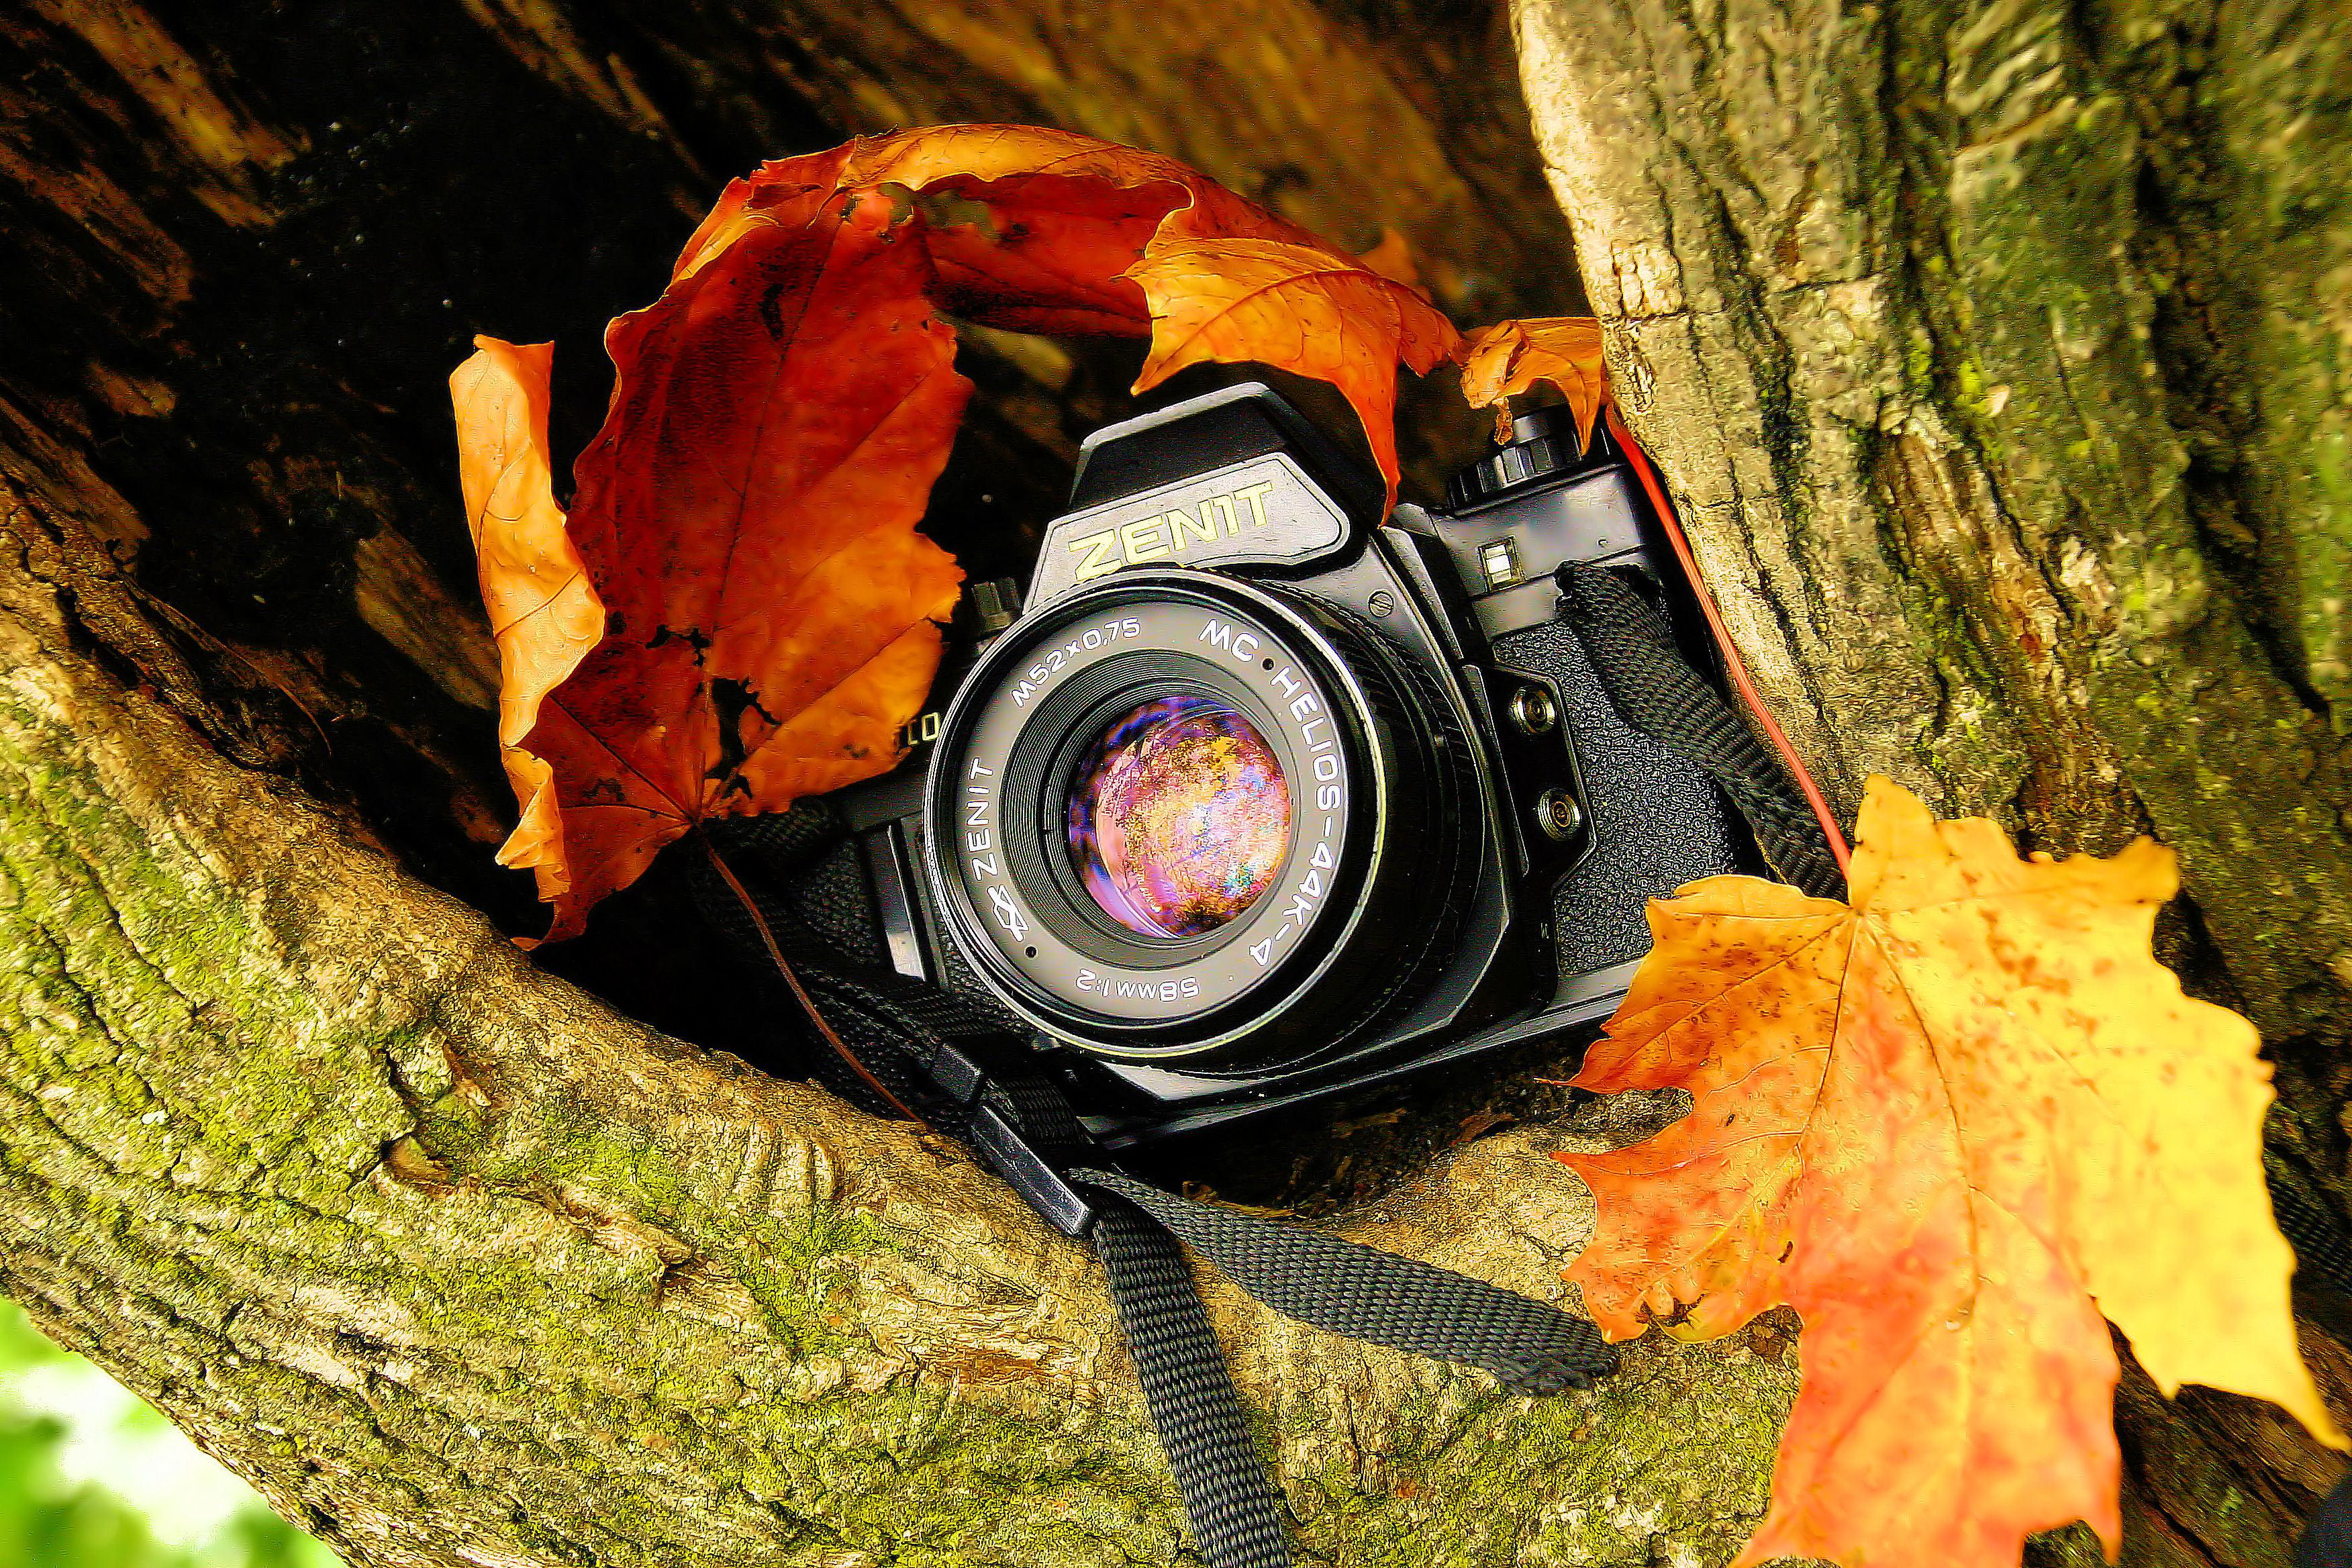 Hd wallpaper camera - Man Made Camera Wallpaper